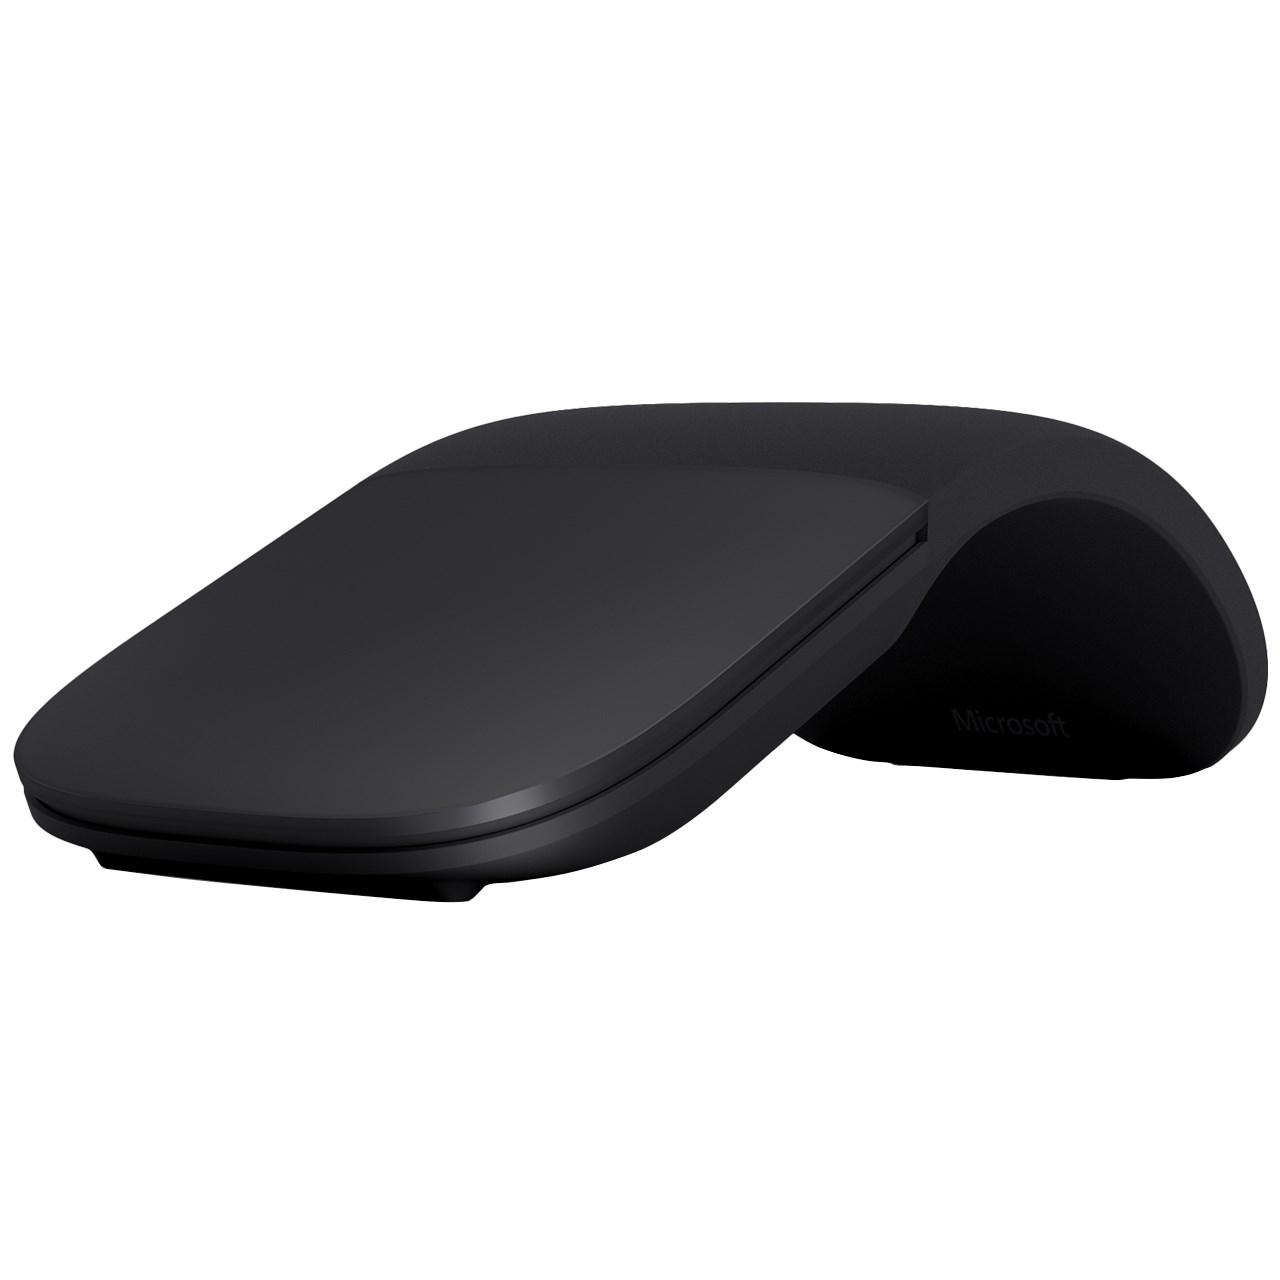 ماوس مایکروسافت مدل 2017 Surface Arc